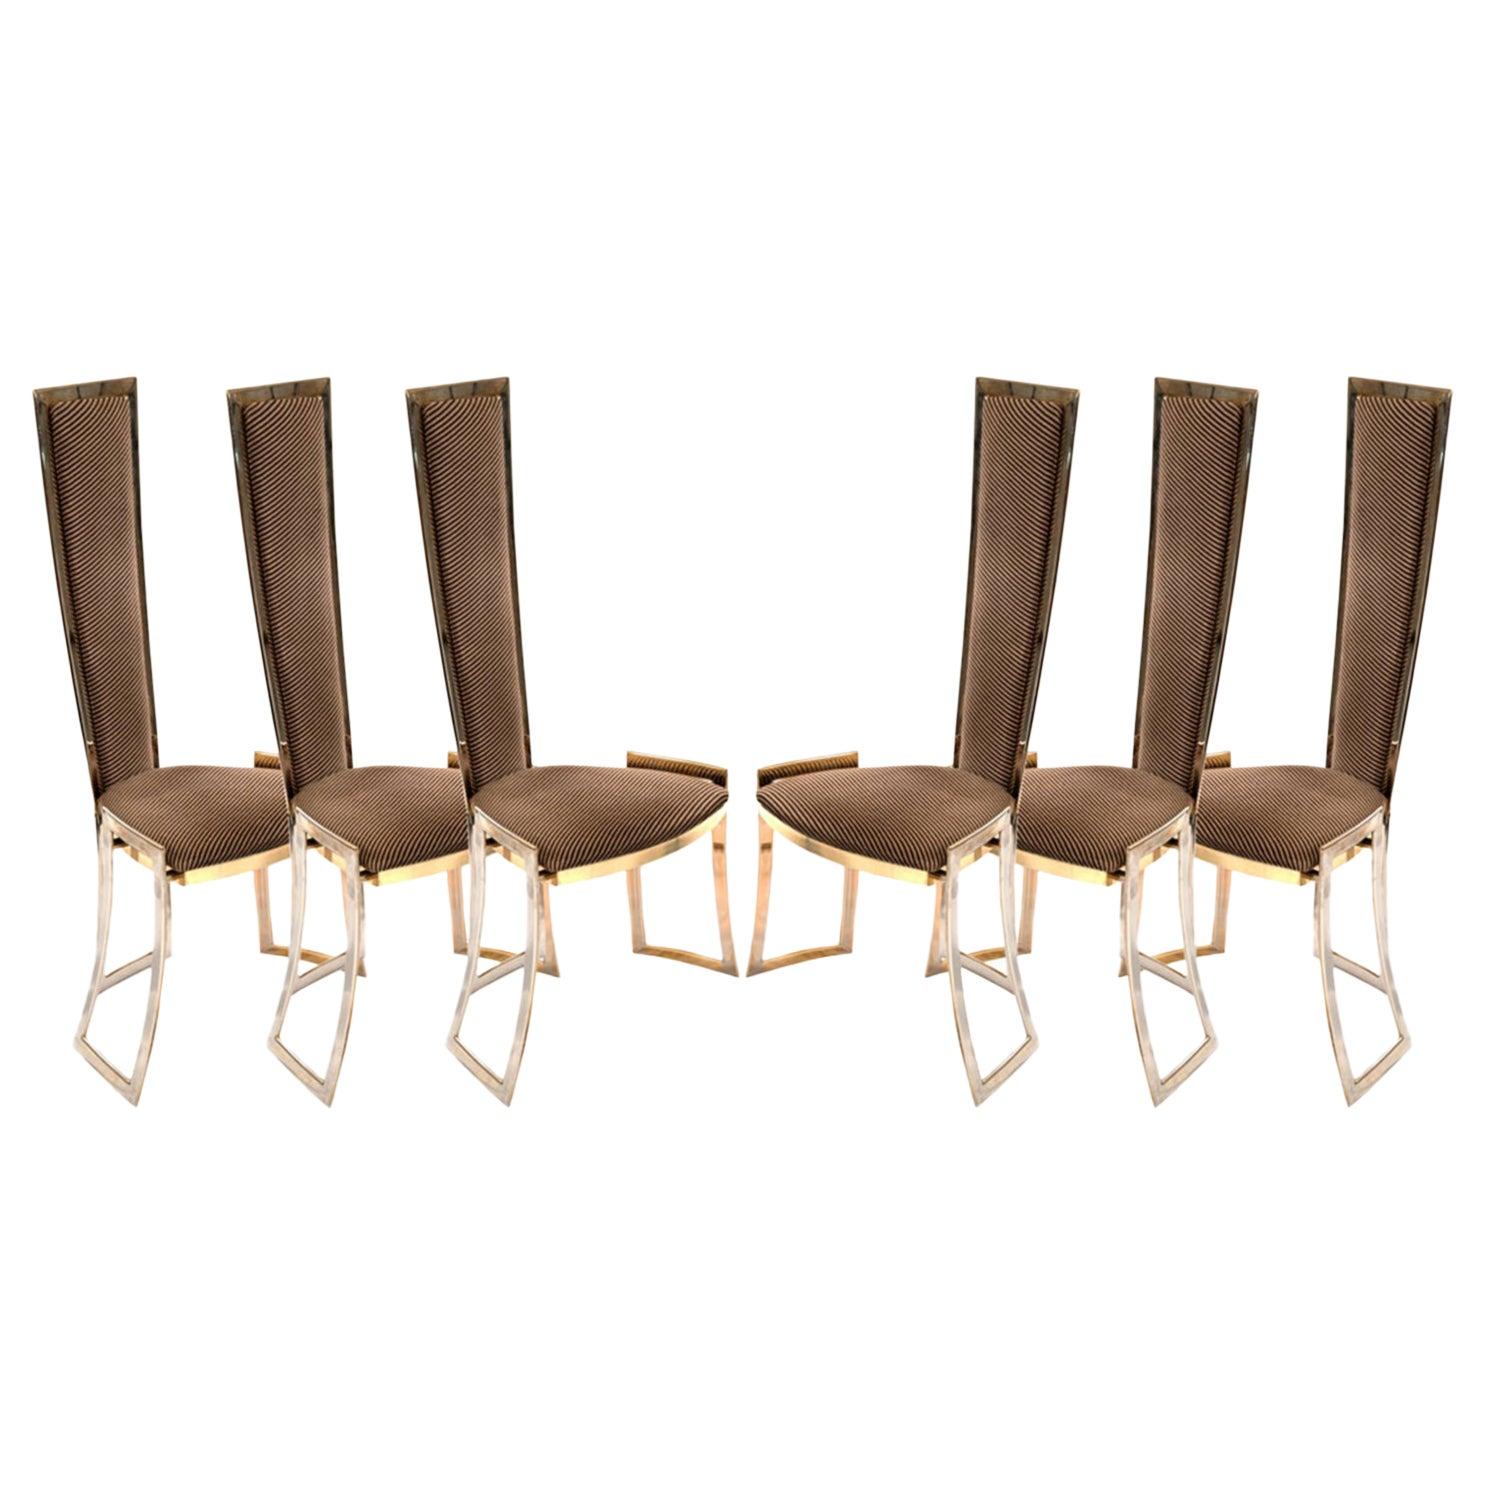 Set of Six High Backed Italian Mid-Century Modern Chairs, circa 1960